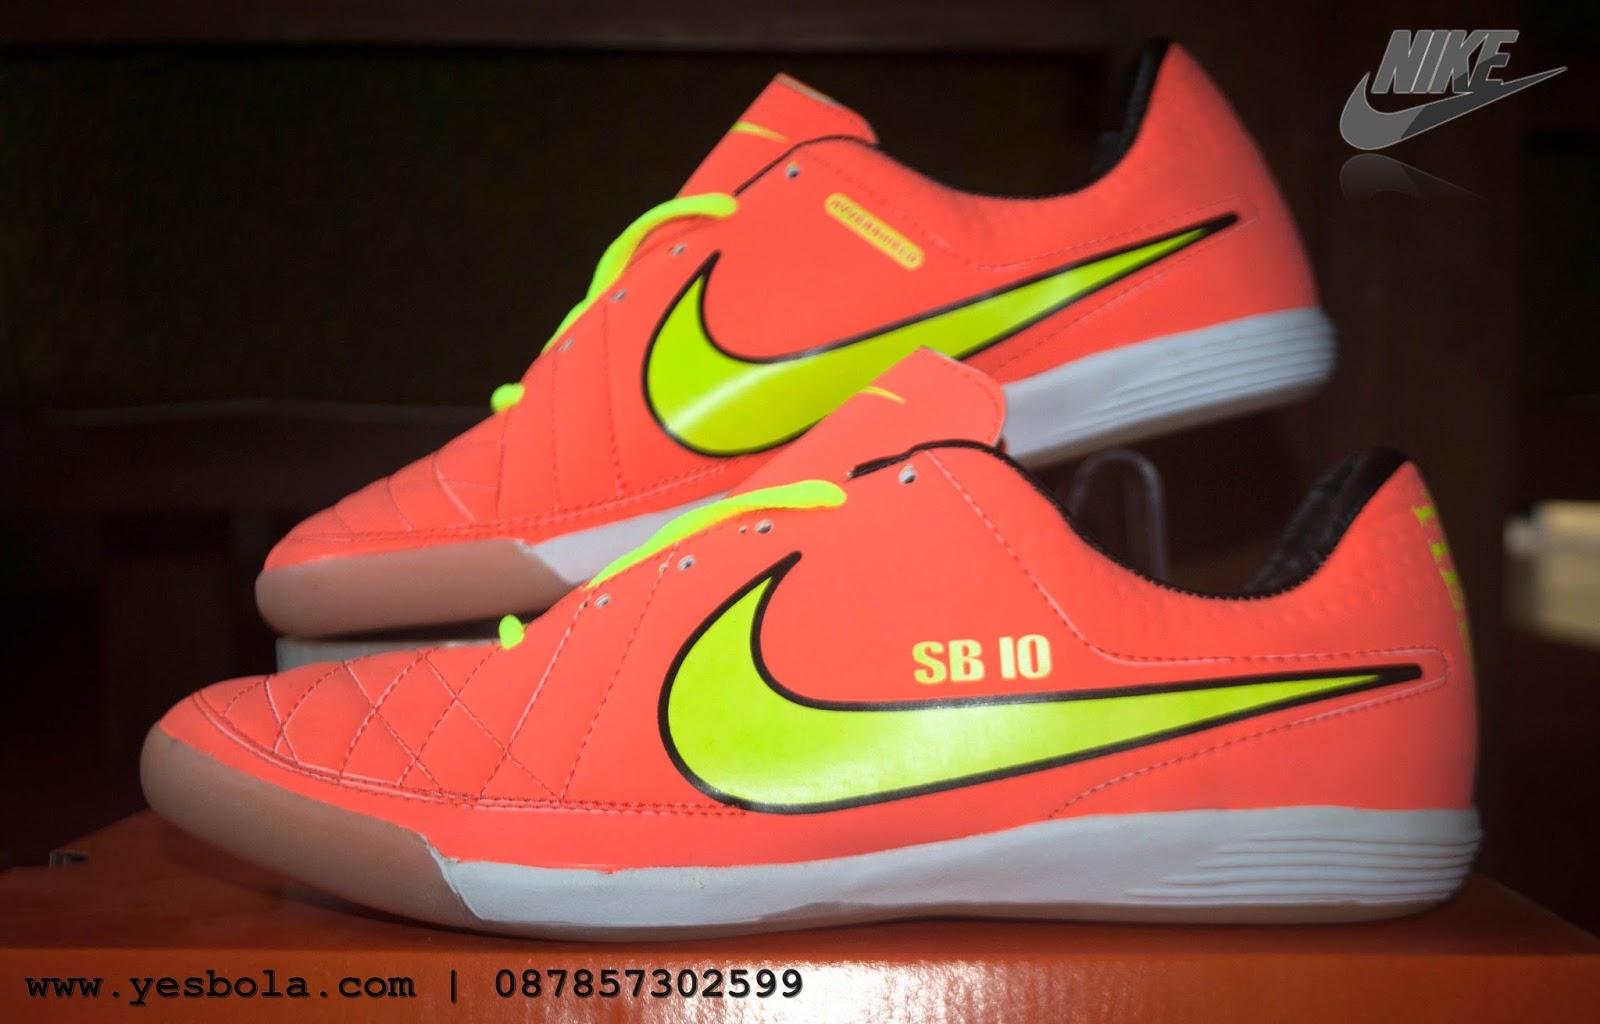 promo code harga sepatu futsal nike mercurial superfly kw bc83b 8c9d4 c78c11f6cd